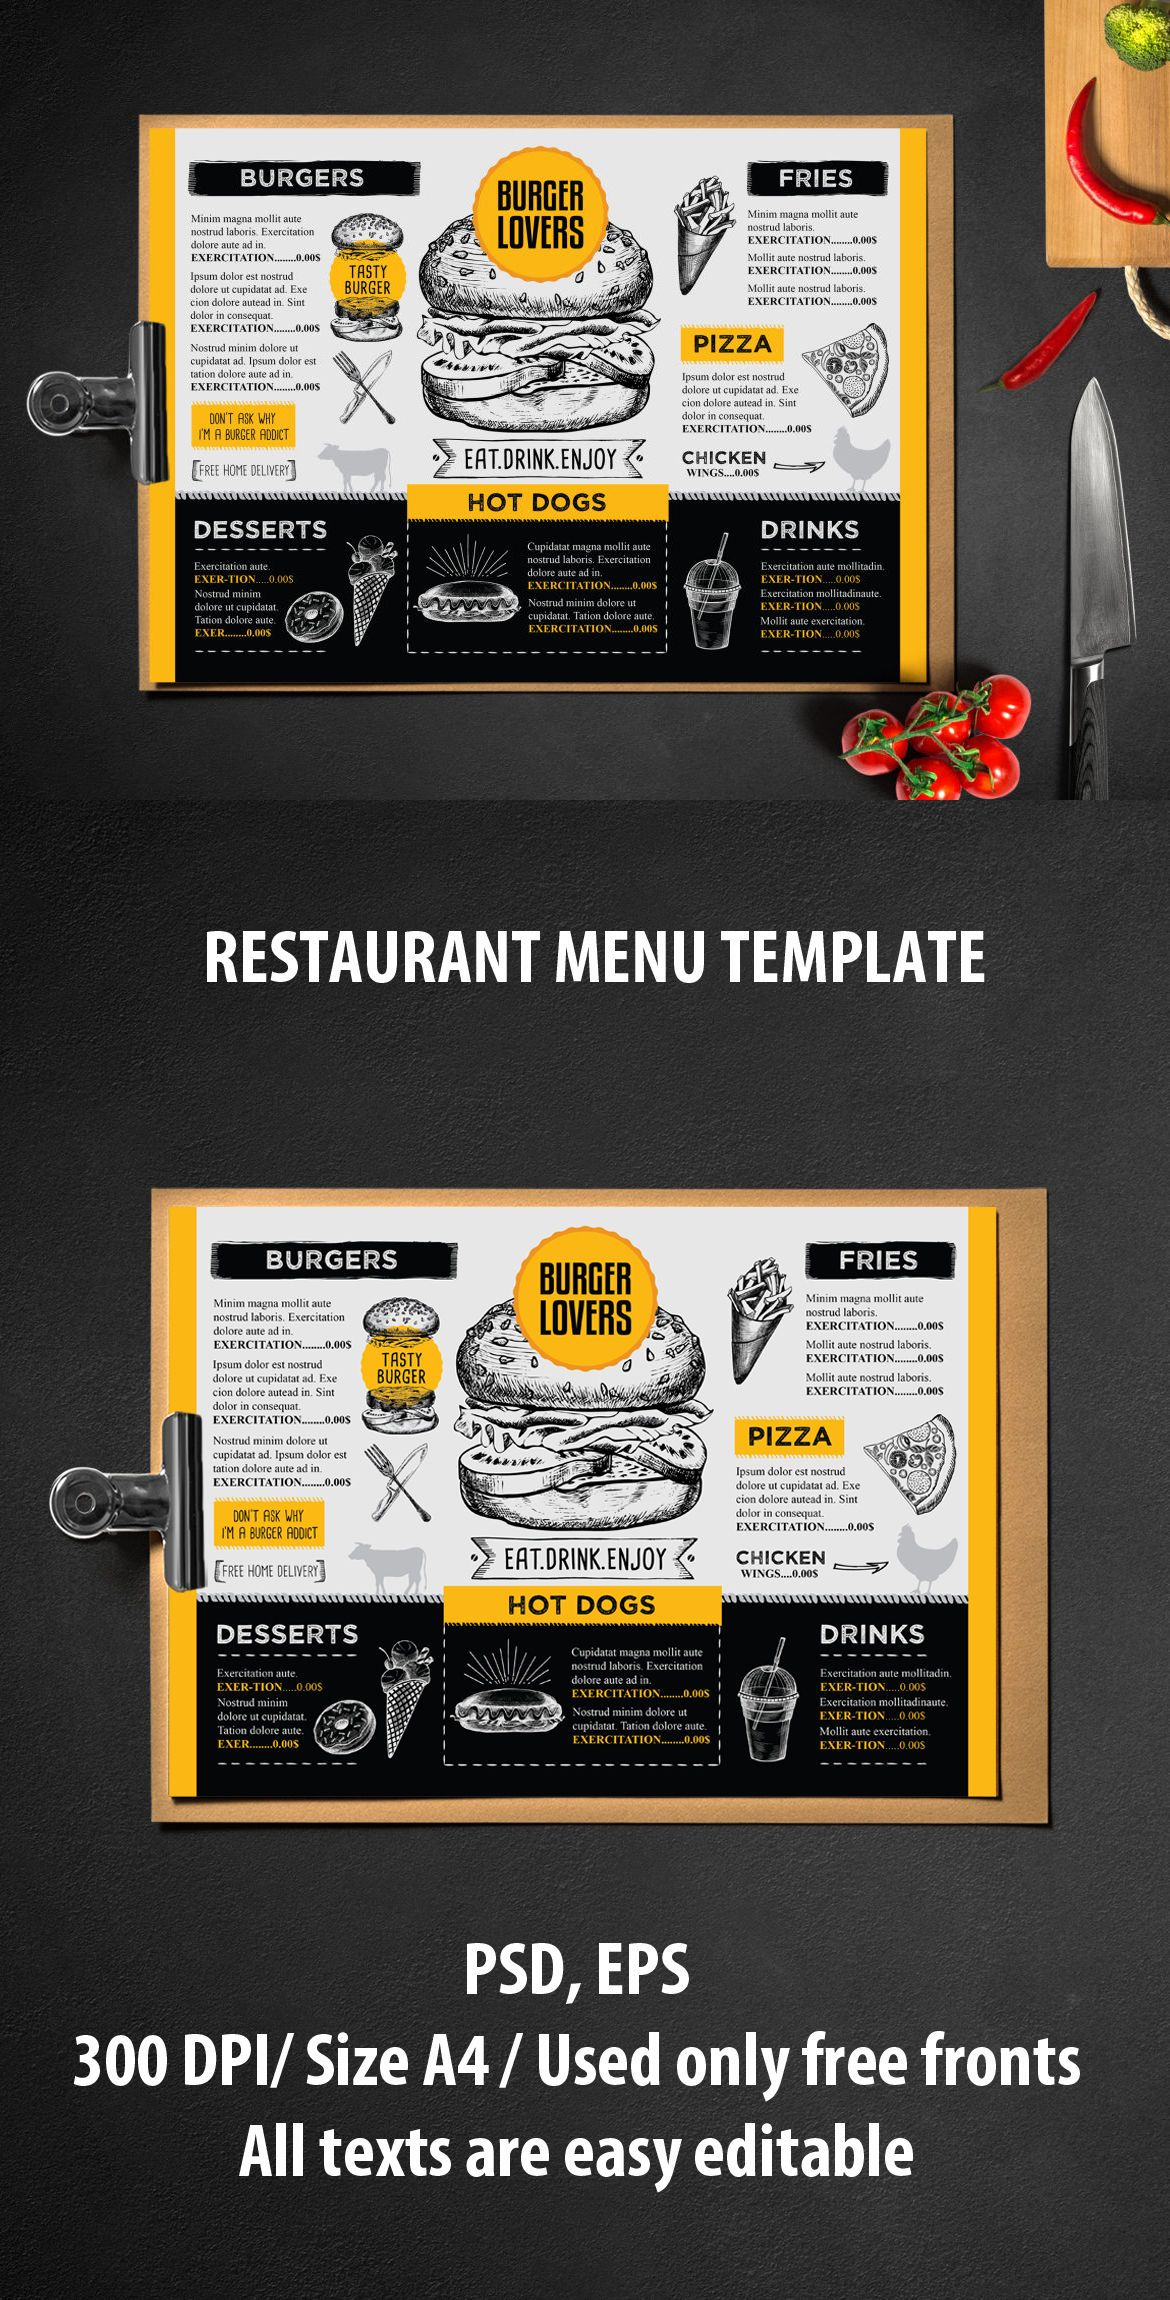 Burger Menu Template Vector Eps Psd Best Food Menu Templates